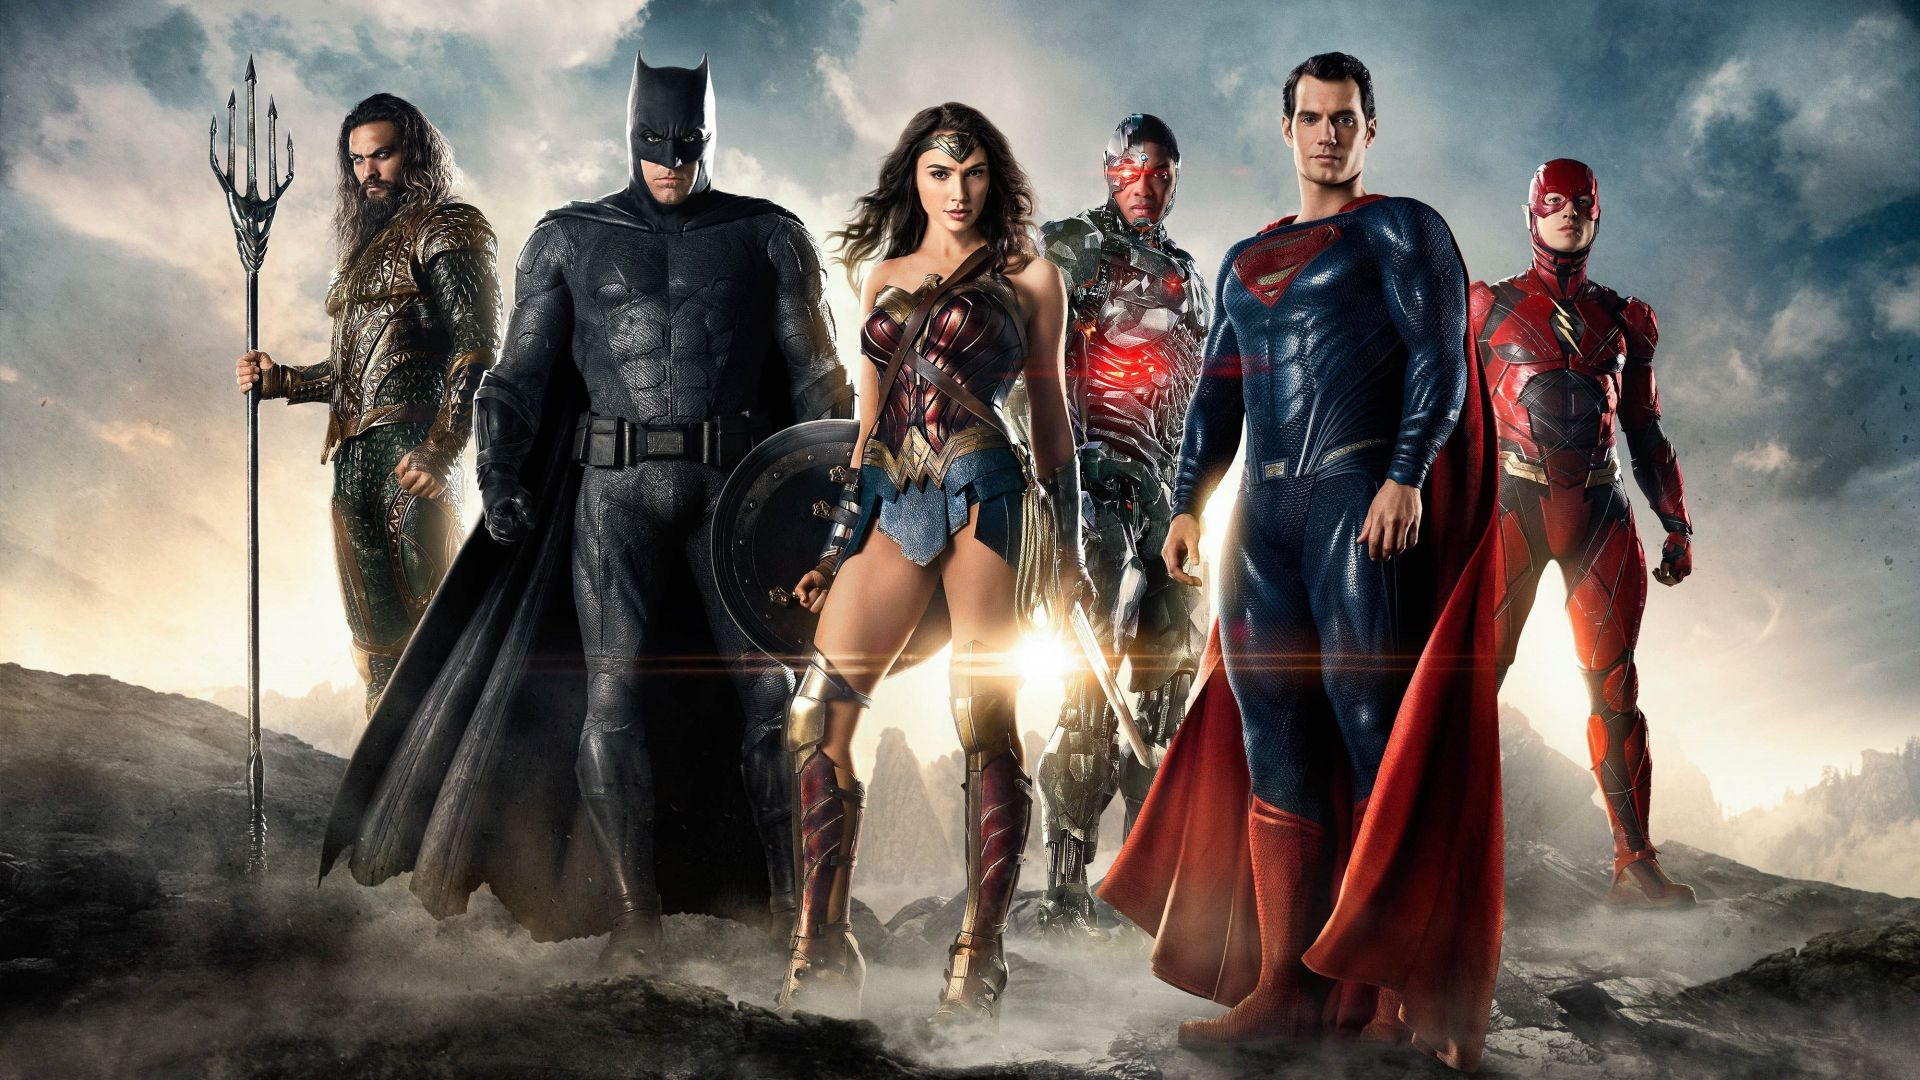 wallpaper justice league movie batman wonder woman 4k